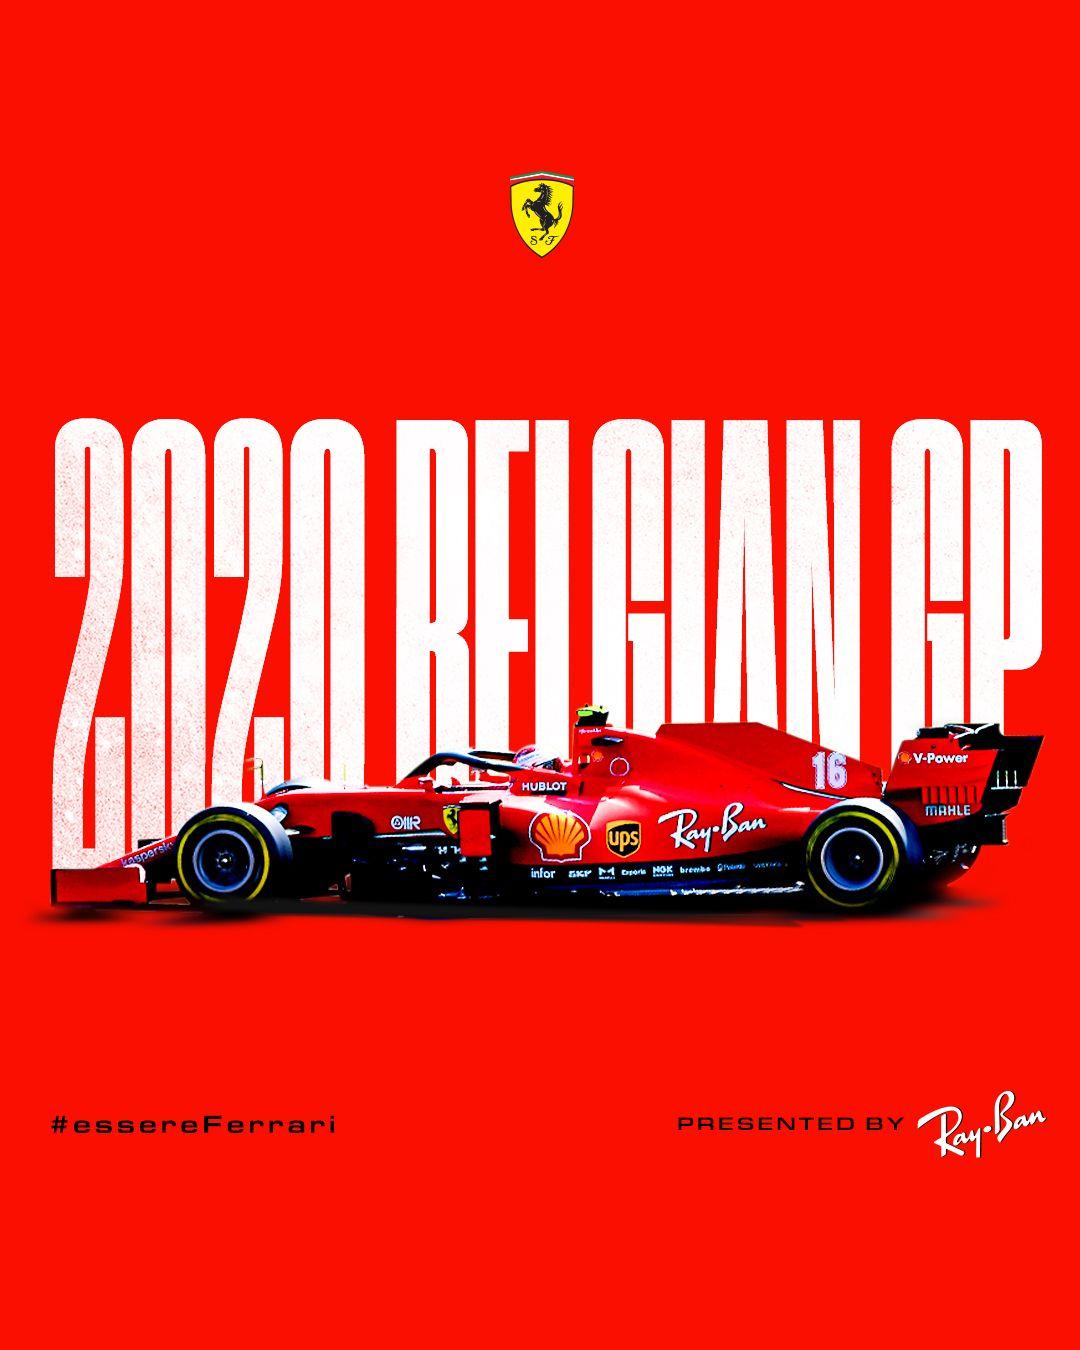 Scuderia Ferrari On Instagram Belgiangp Race Day Presented By Rayban Essereferrari Race Day Formula 1 16 V